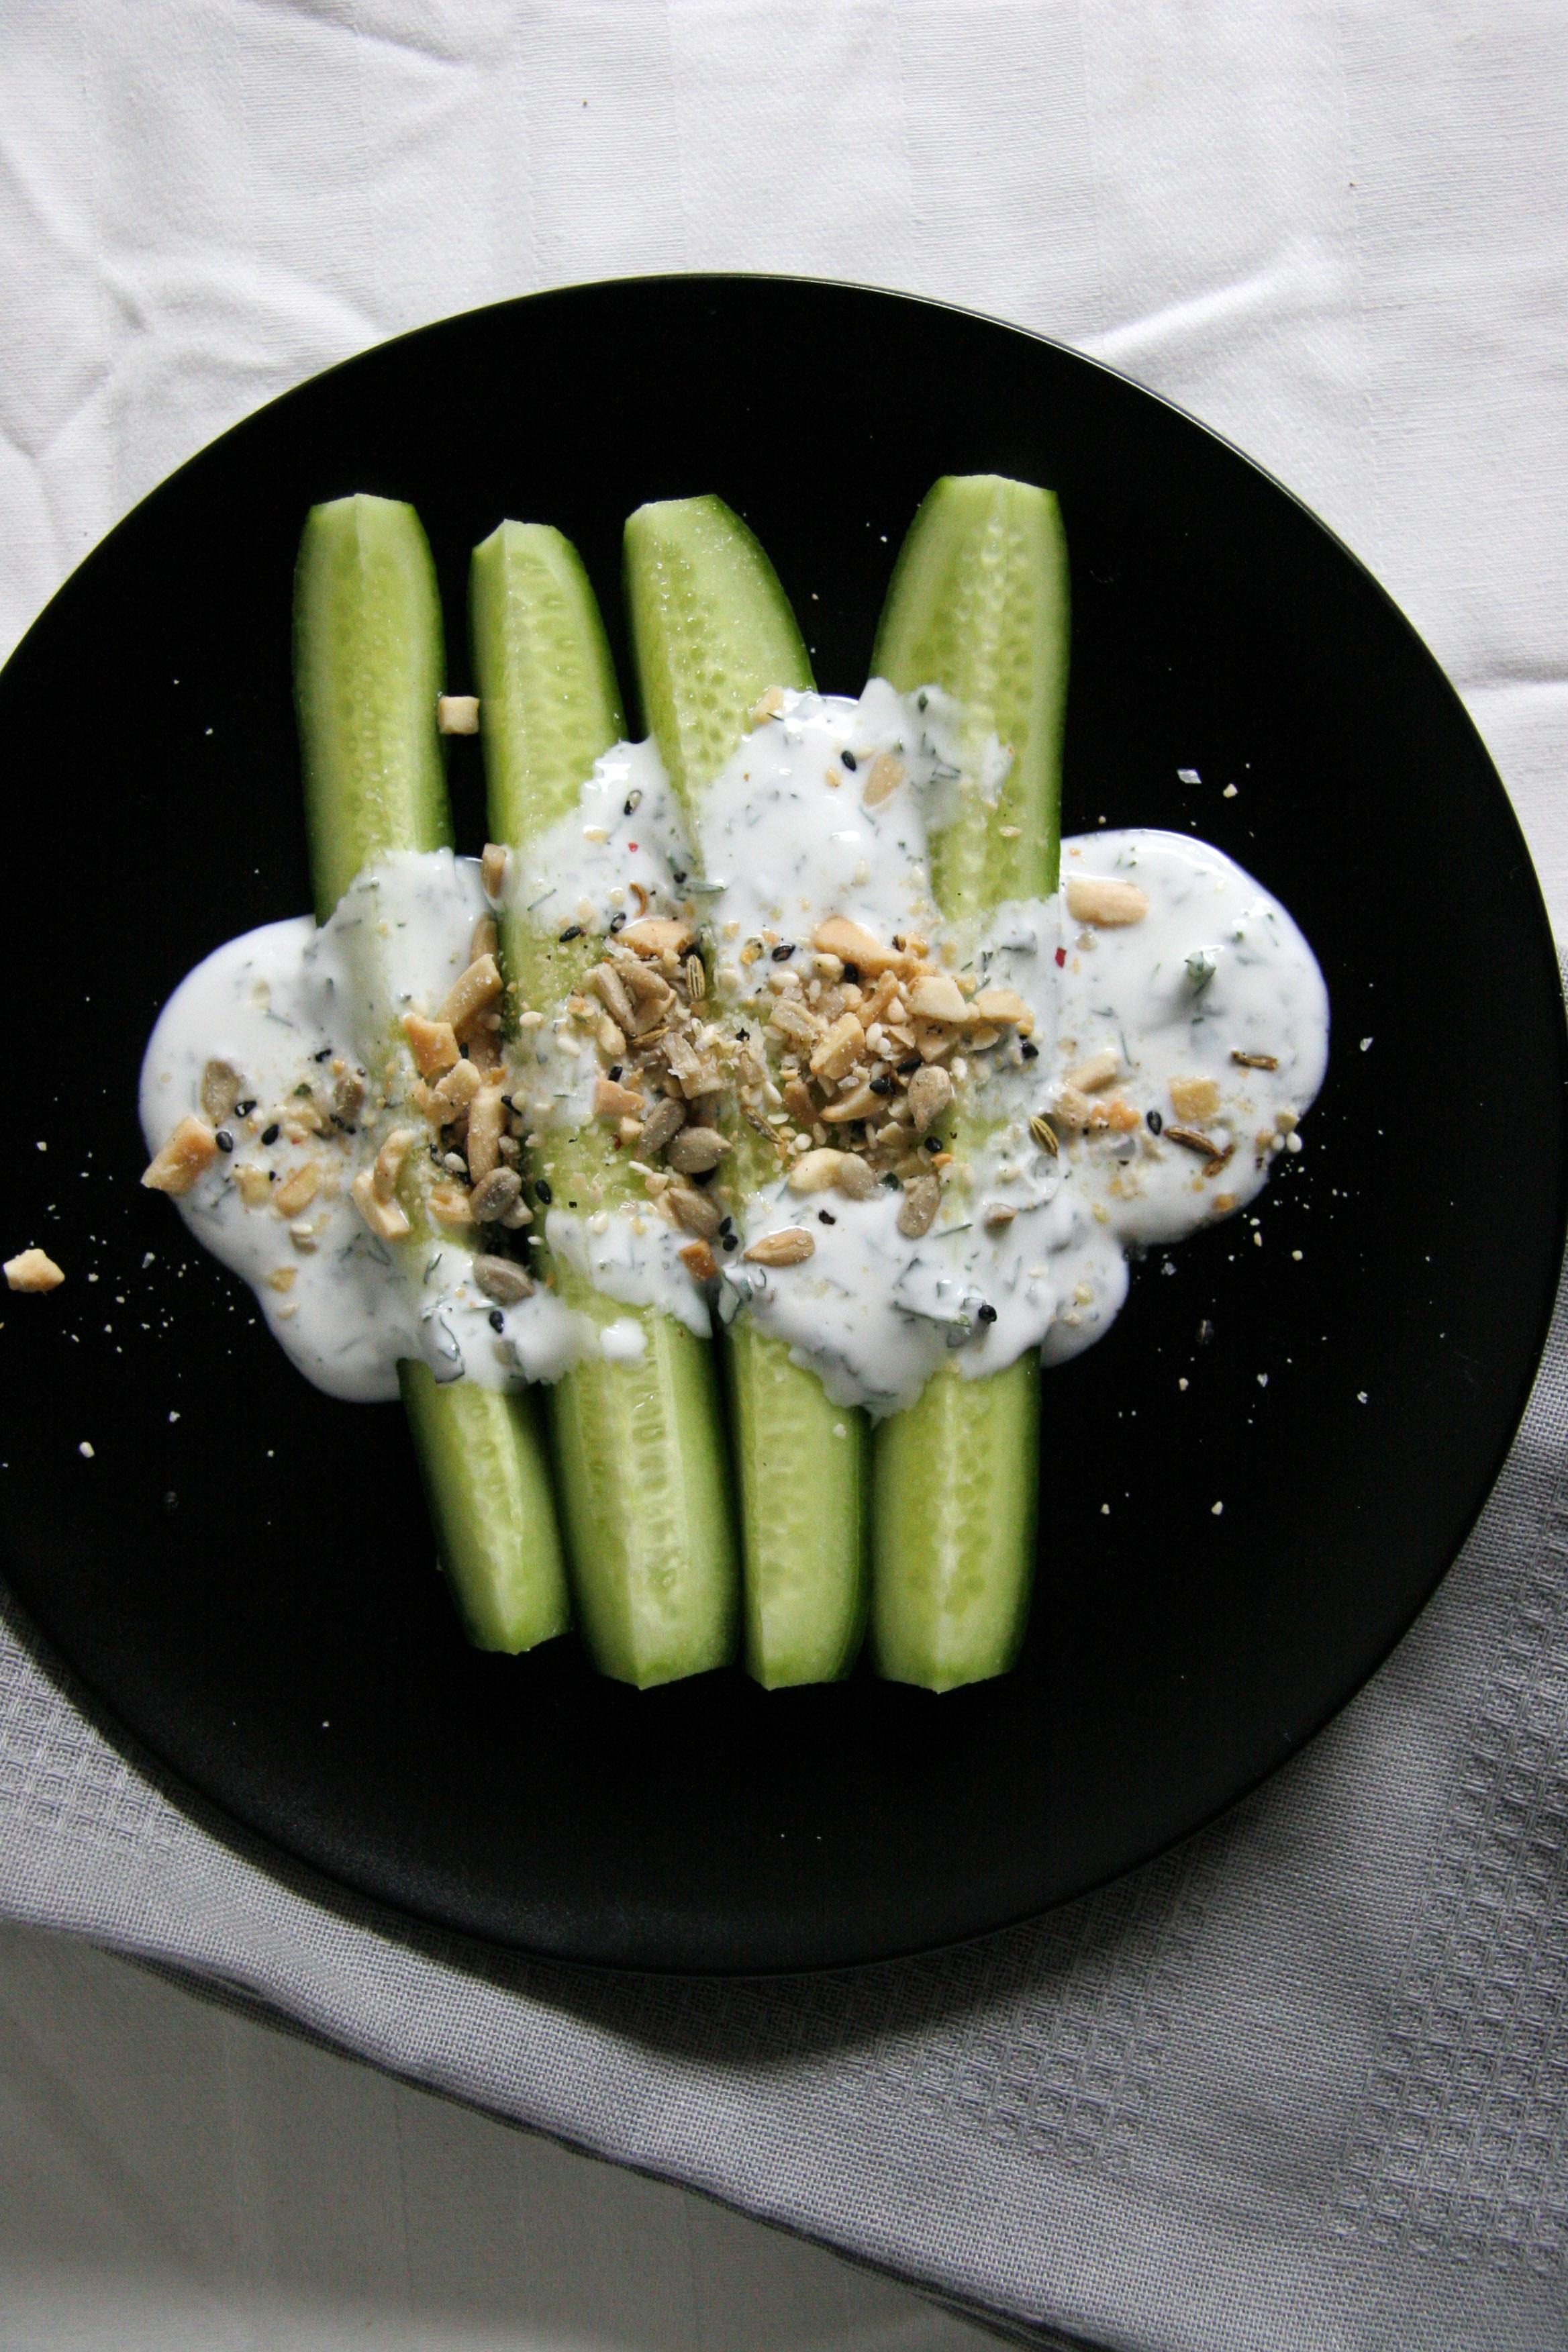 Healthy Cucumber Dukkah Snack with herbed yogurt.